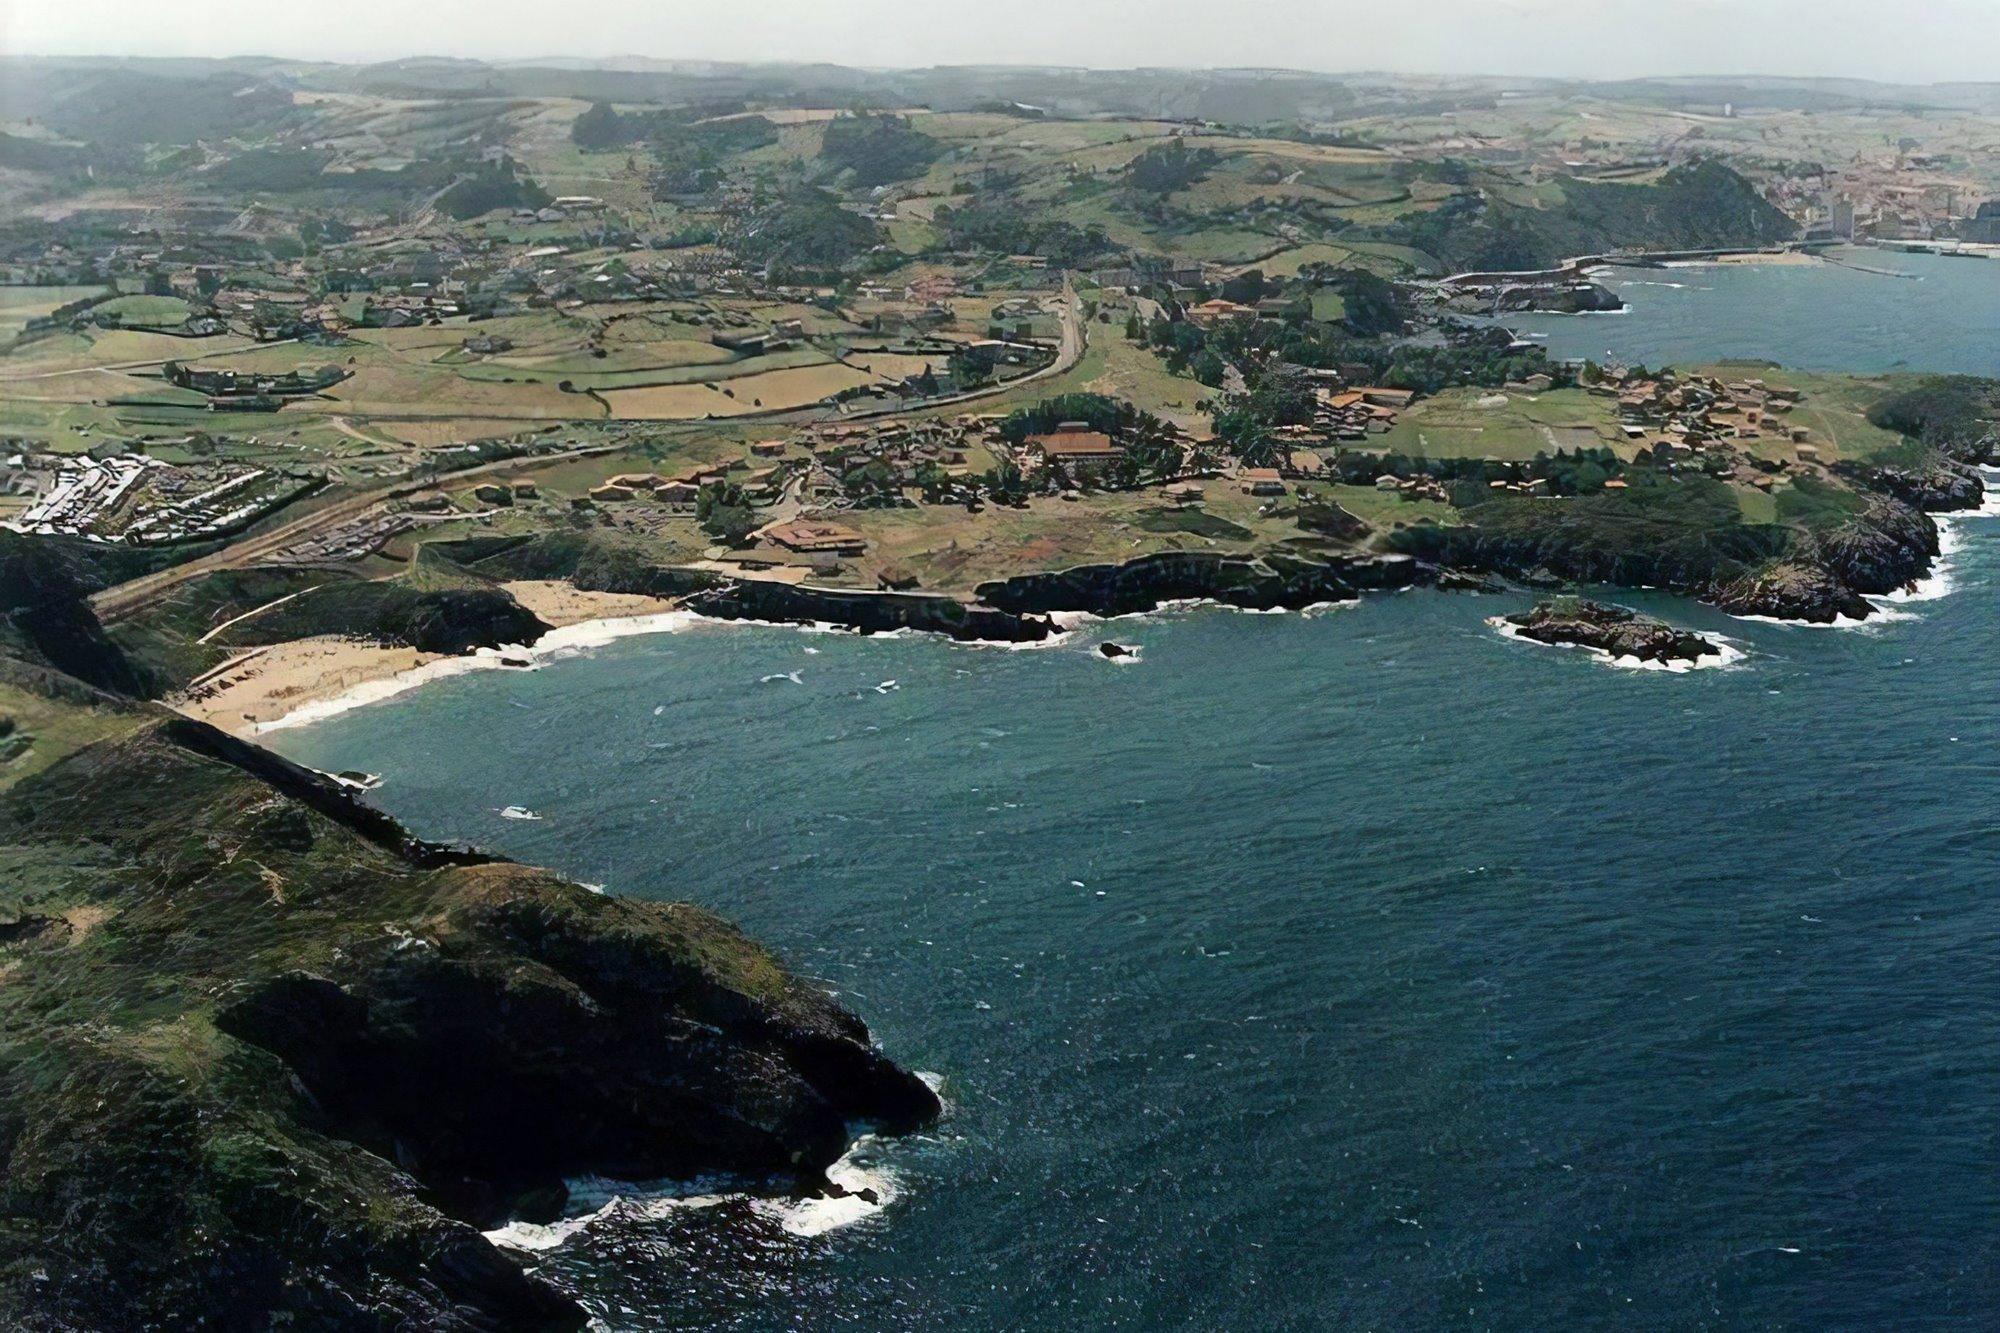 plage de Carreño